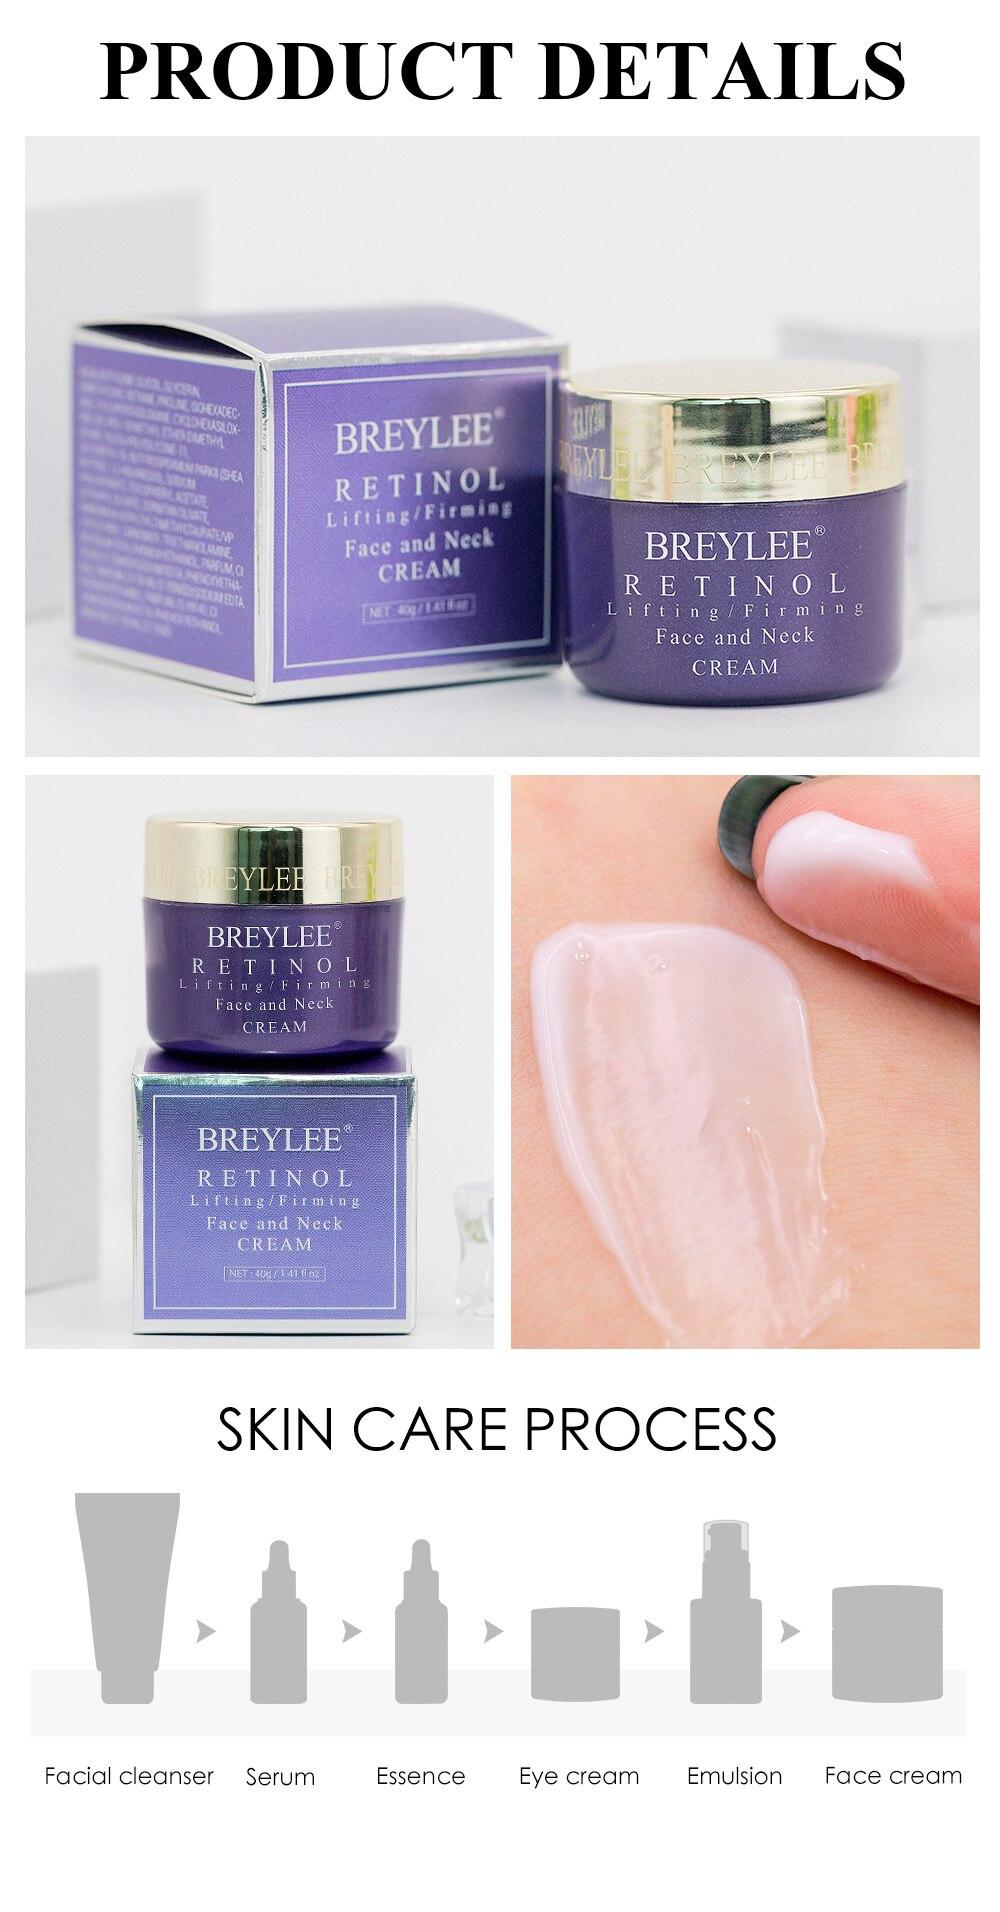 BREYLEE Retinol LiftingFirming Face And Neck Cream Anti-aging Anti-Eye Bag anti wrinkle Eye Cream Age Revolution Ageless Young 7